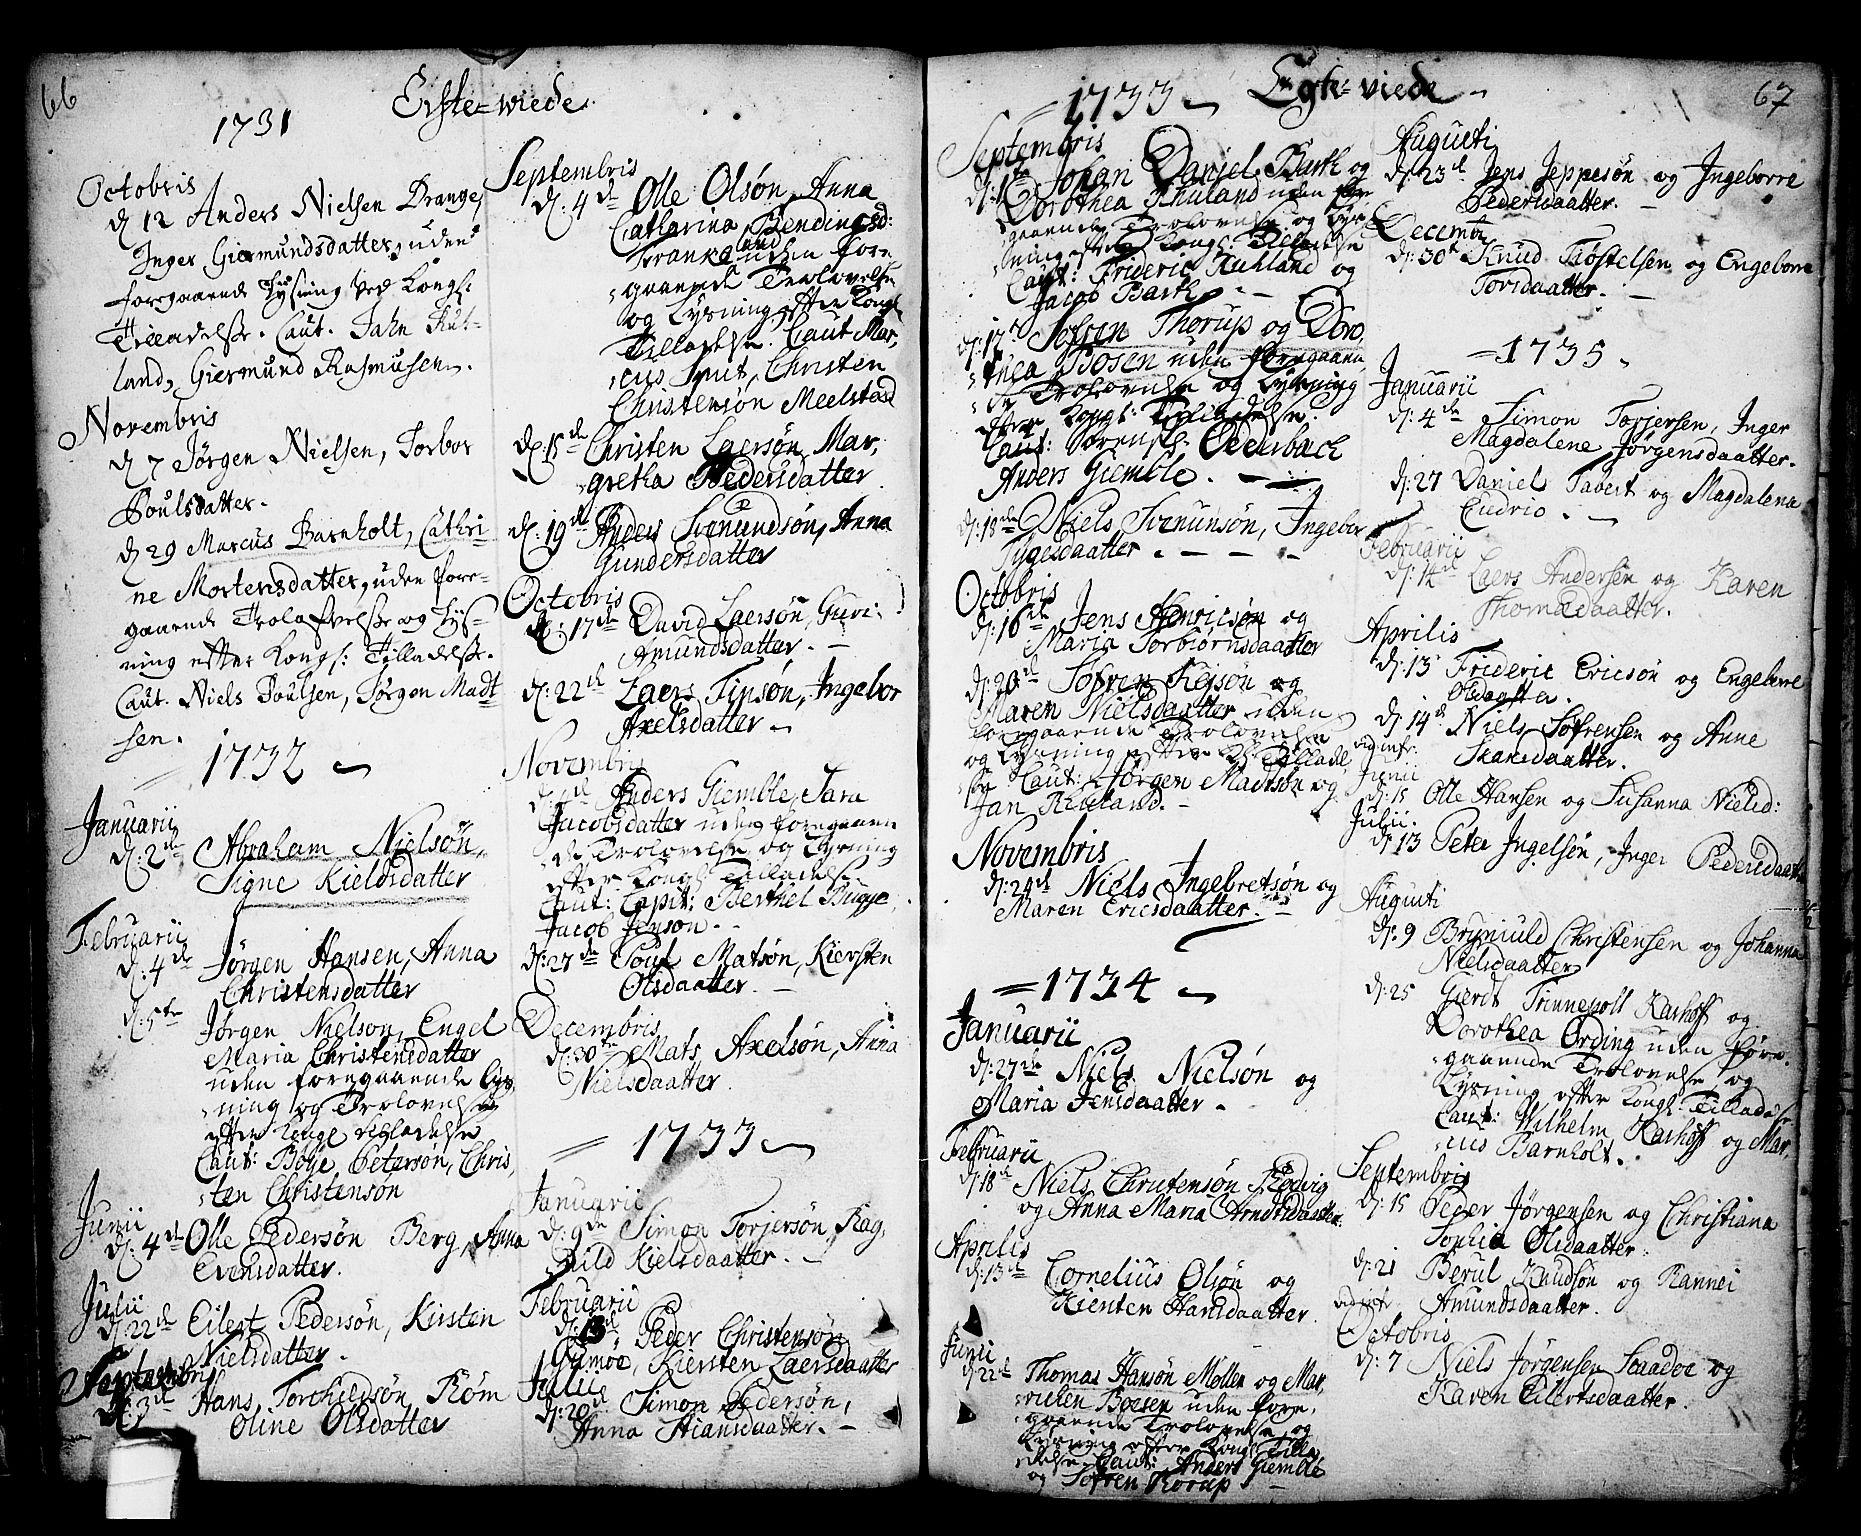 SAKO, Kragerø kirkebøker, F/Fa/L0001: Ministerialbok nr. 1, 1702-1766, s. 66-67